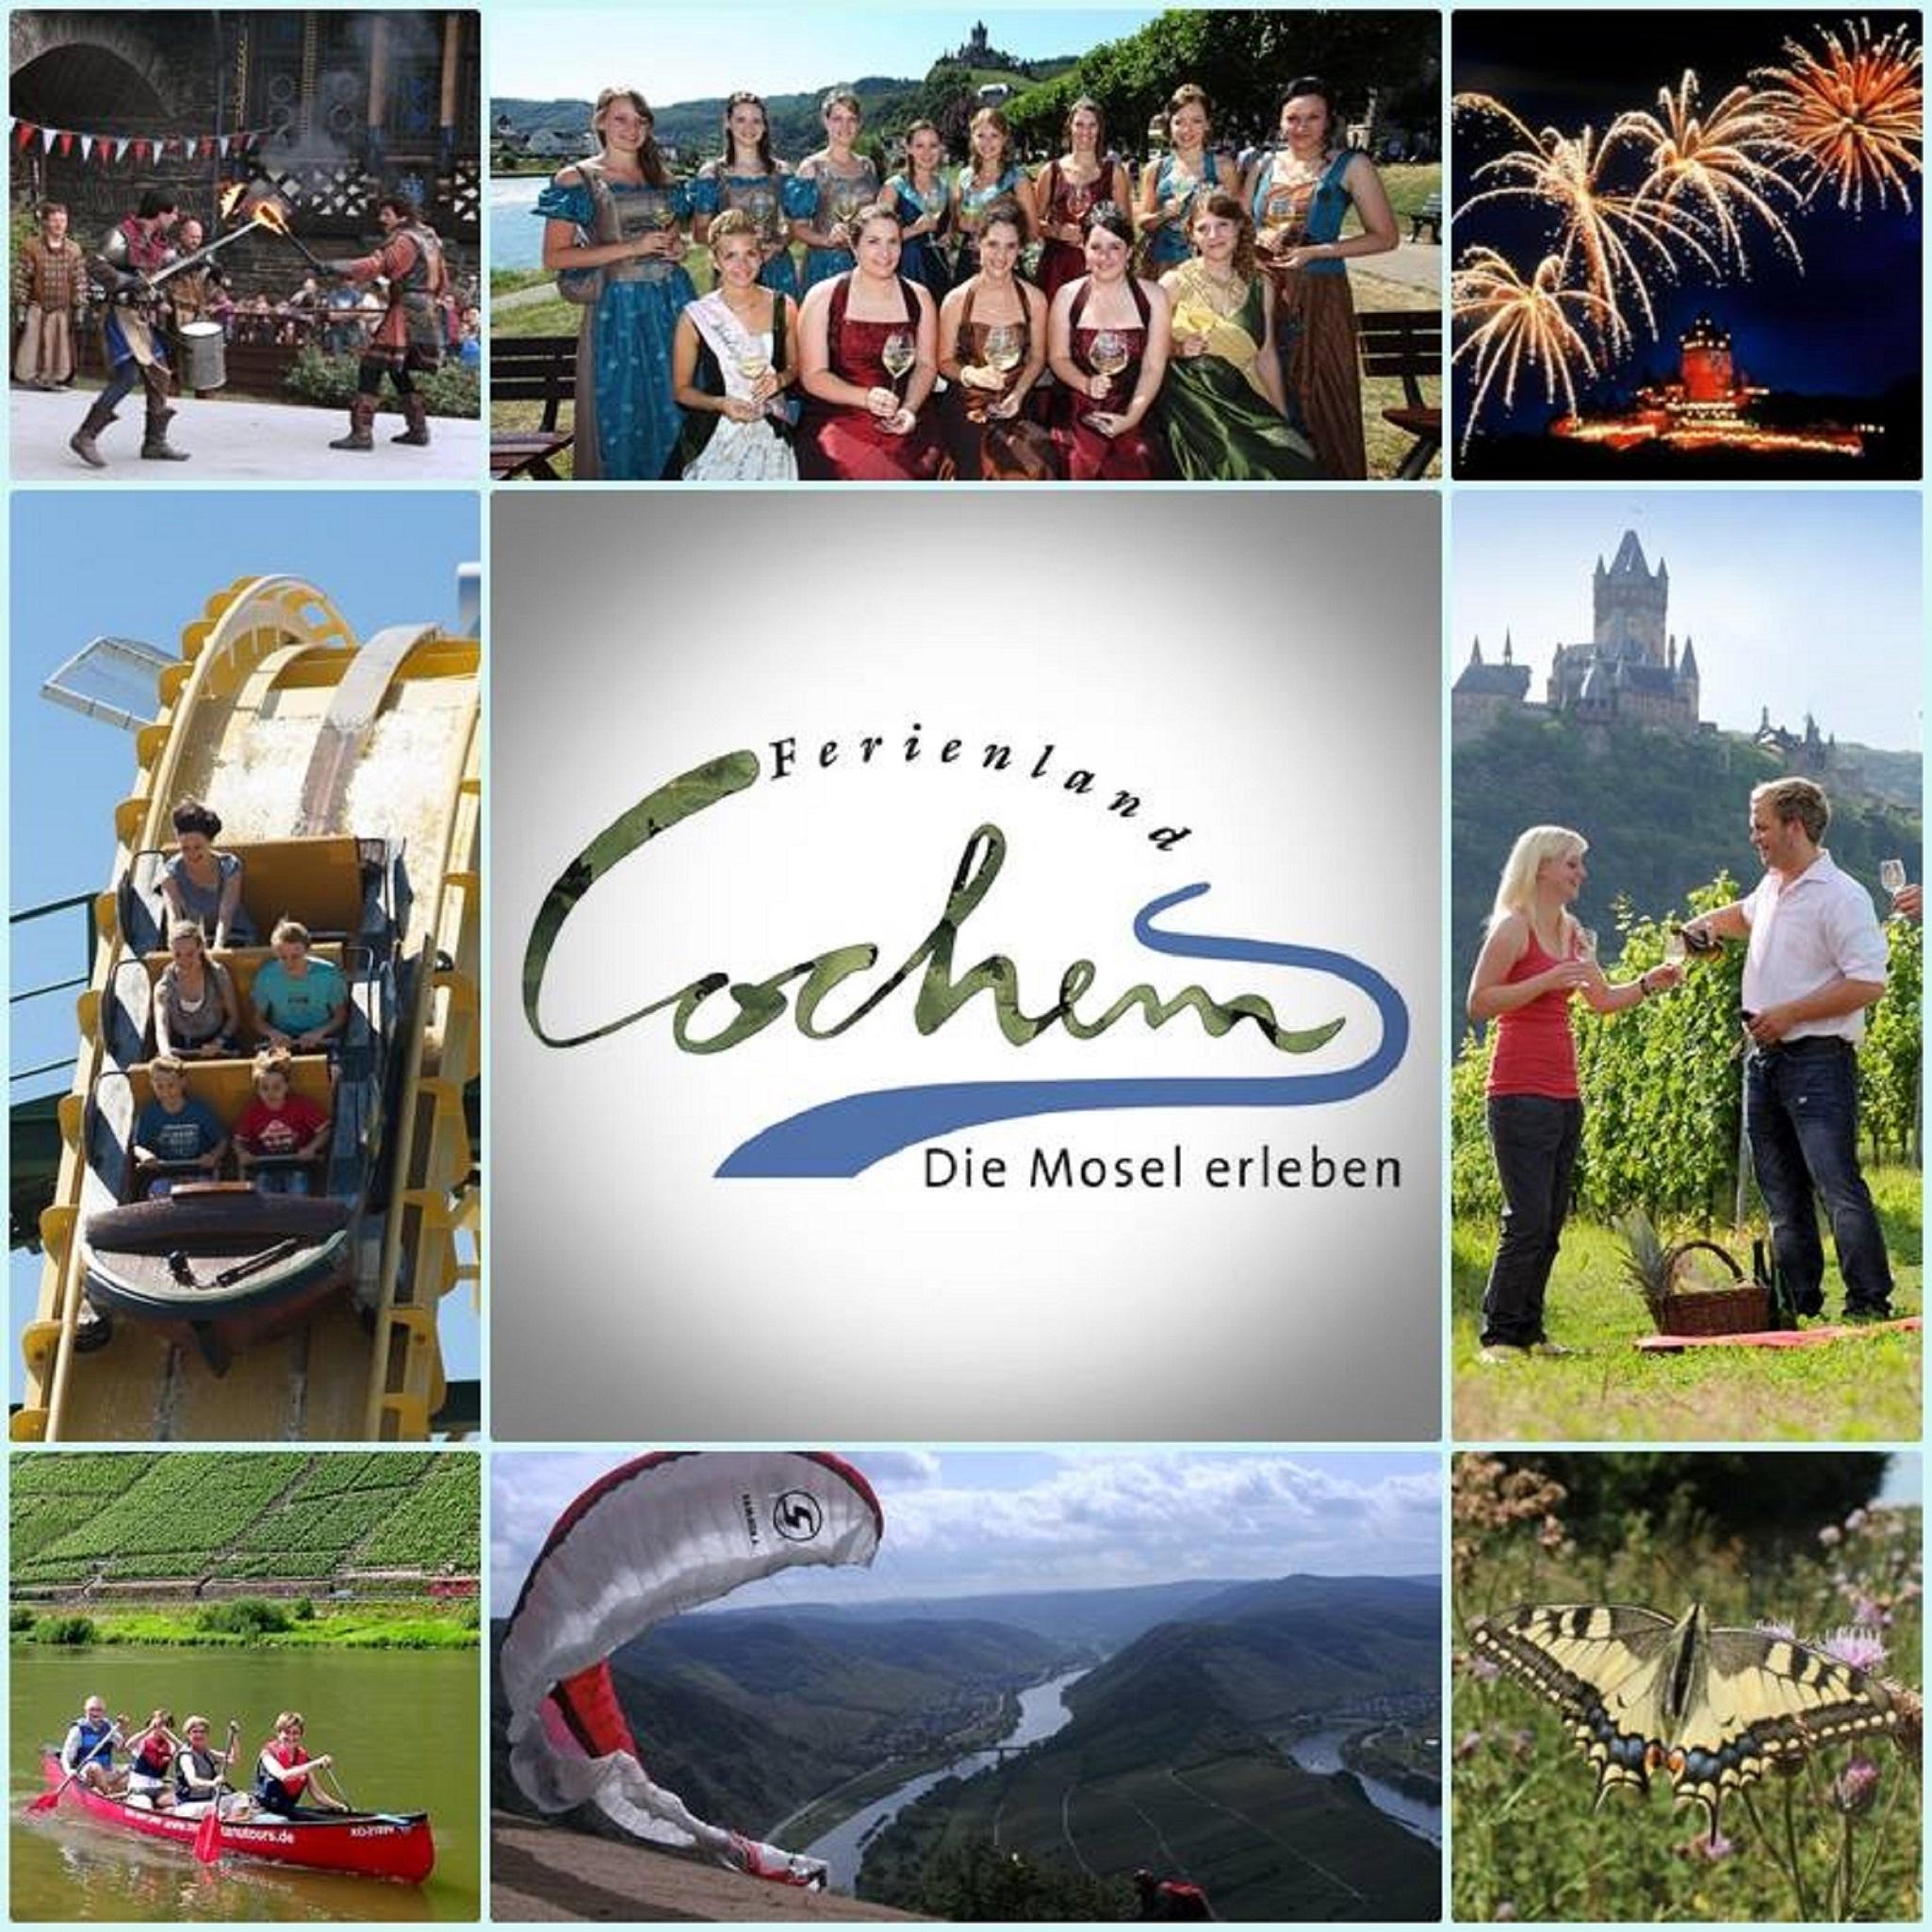 Sonnenblick_Cochem_Mosel_18